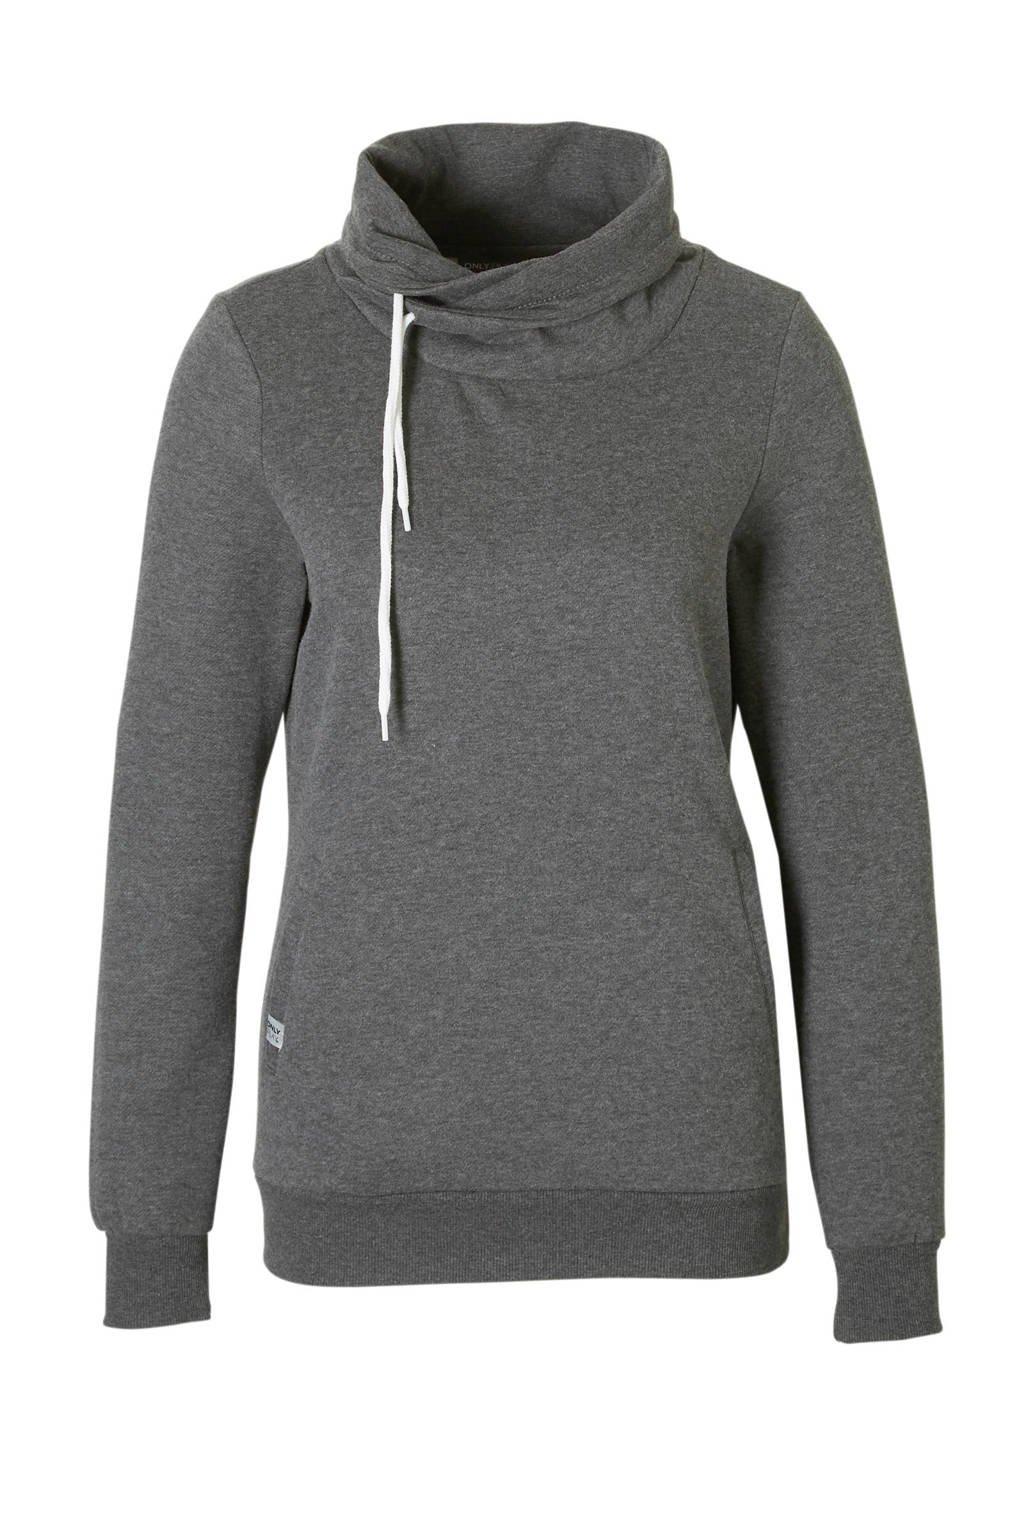 Only Play sportsweater grijs, Grijs melange